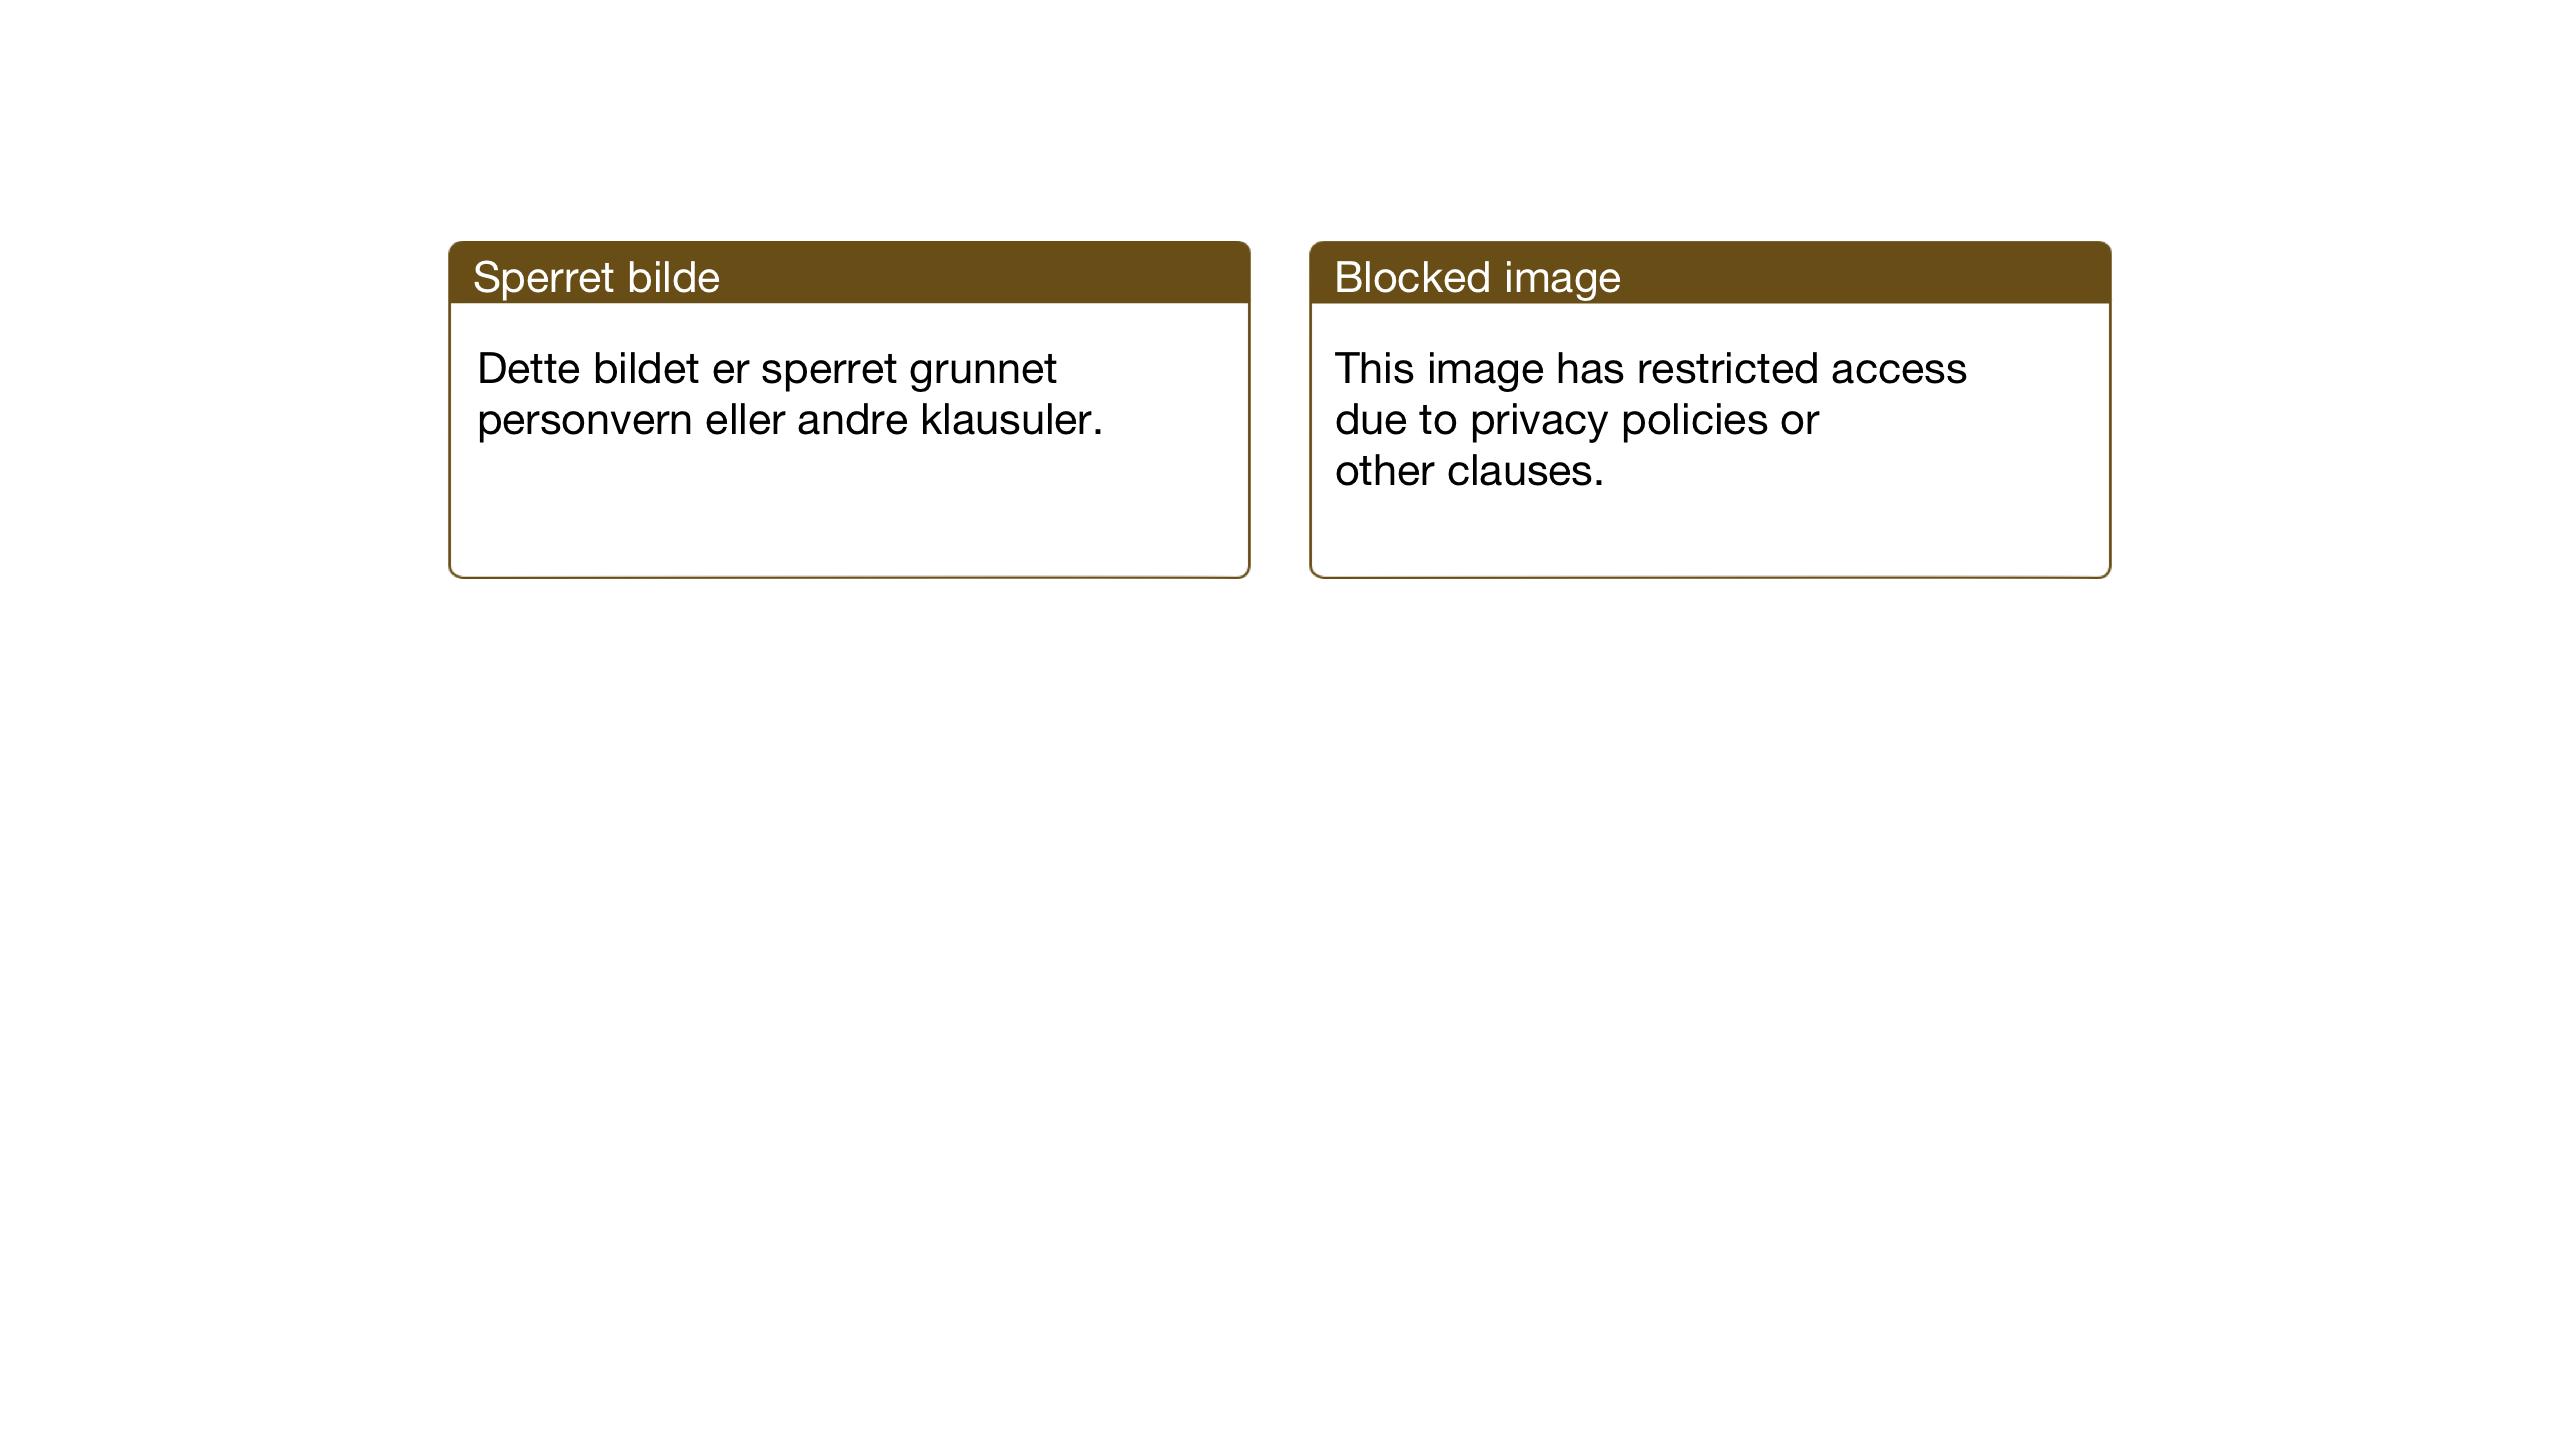 SAH, Vardal prestekontor, H/Ha/Haa/L0018: Ministerialbok nr. 18, 1930-1945, s. 35